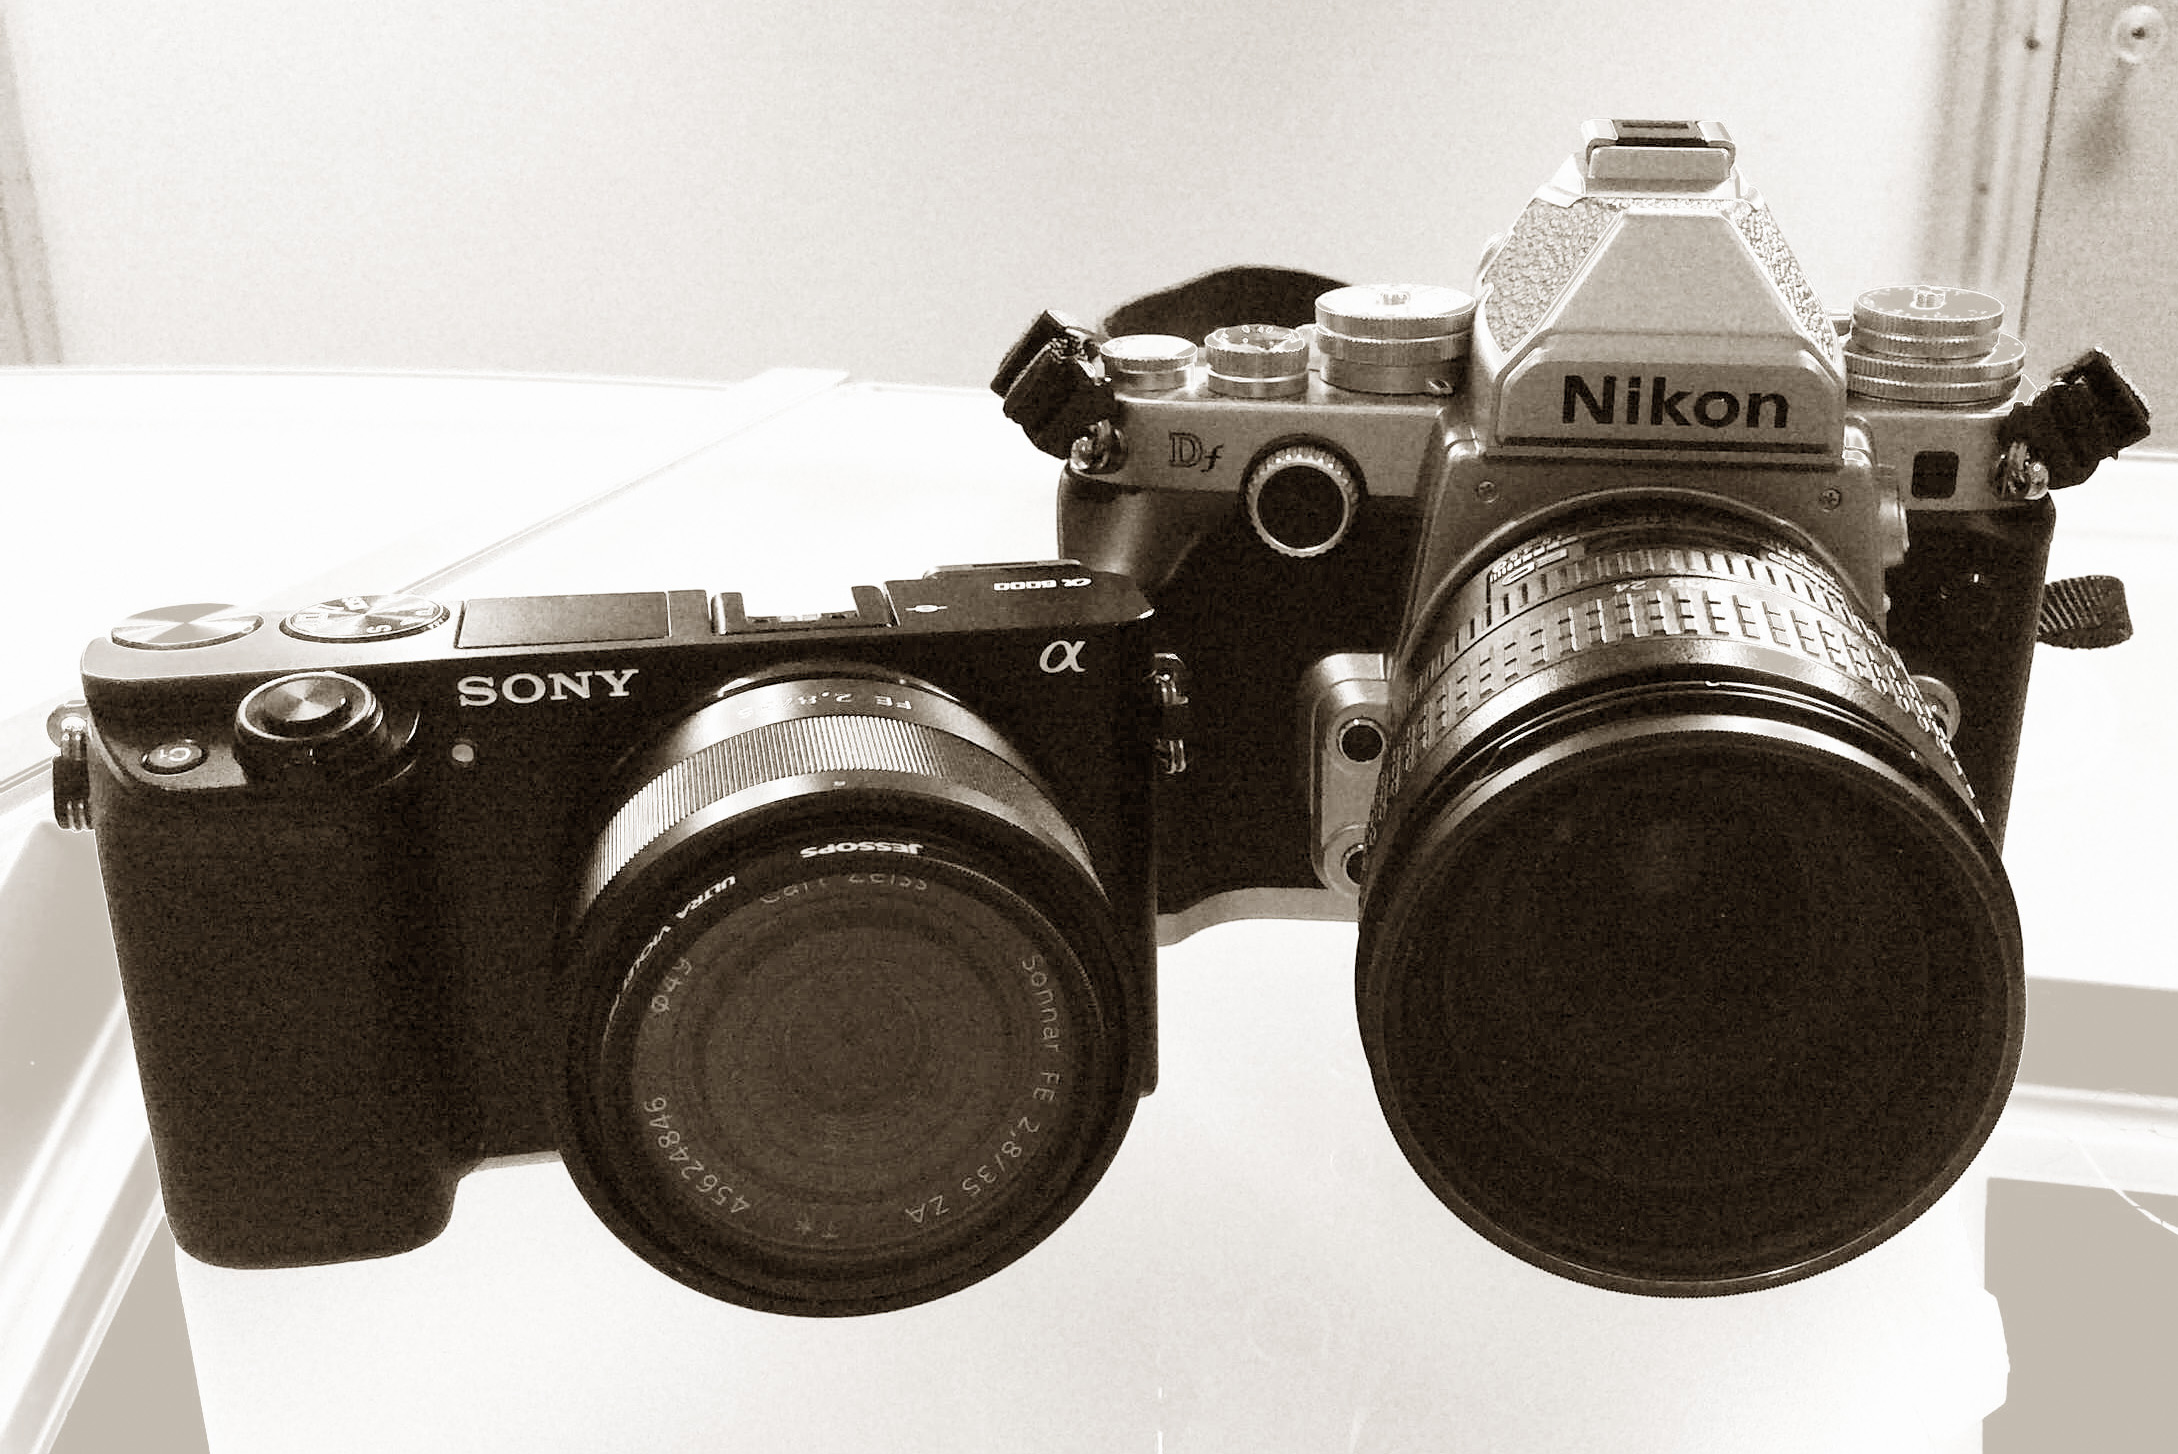 Sony a6000,  Sony FE 35mm f2.8 ZA Carl Zeiss Sonnar T* Lens, Nikon Df DSLR